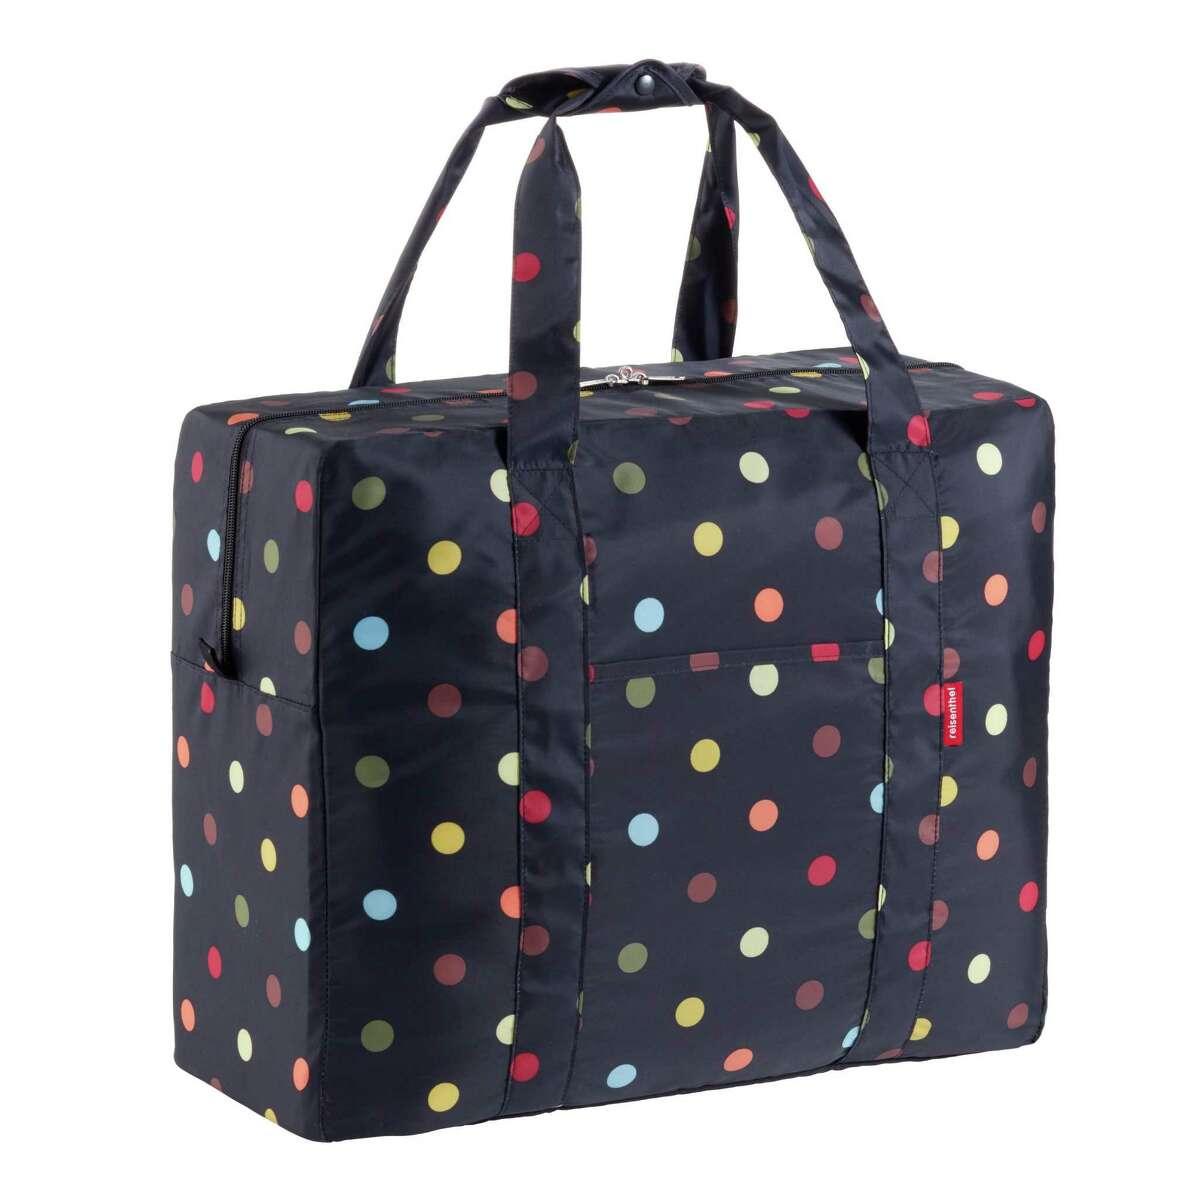 Reisenthal Black Multi Dots Bag, $24.99